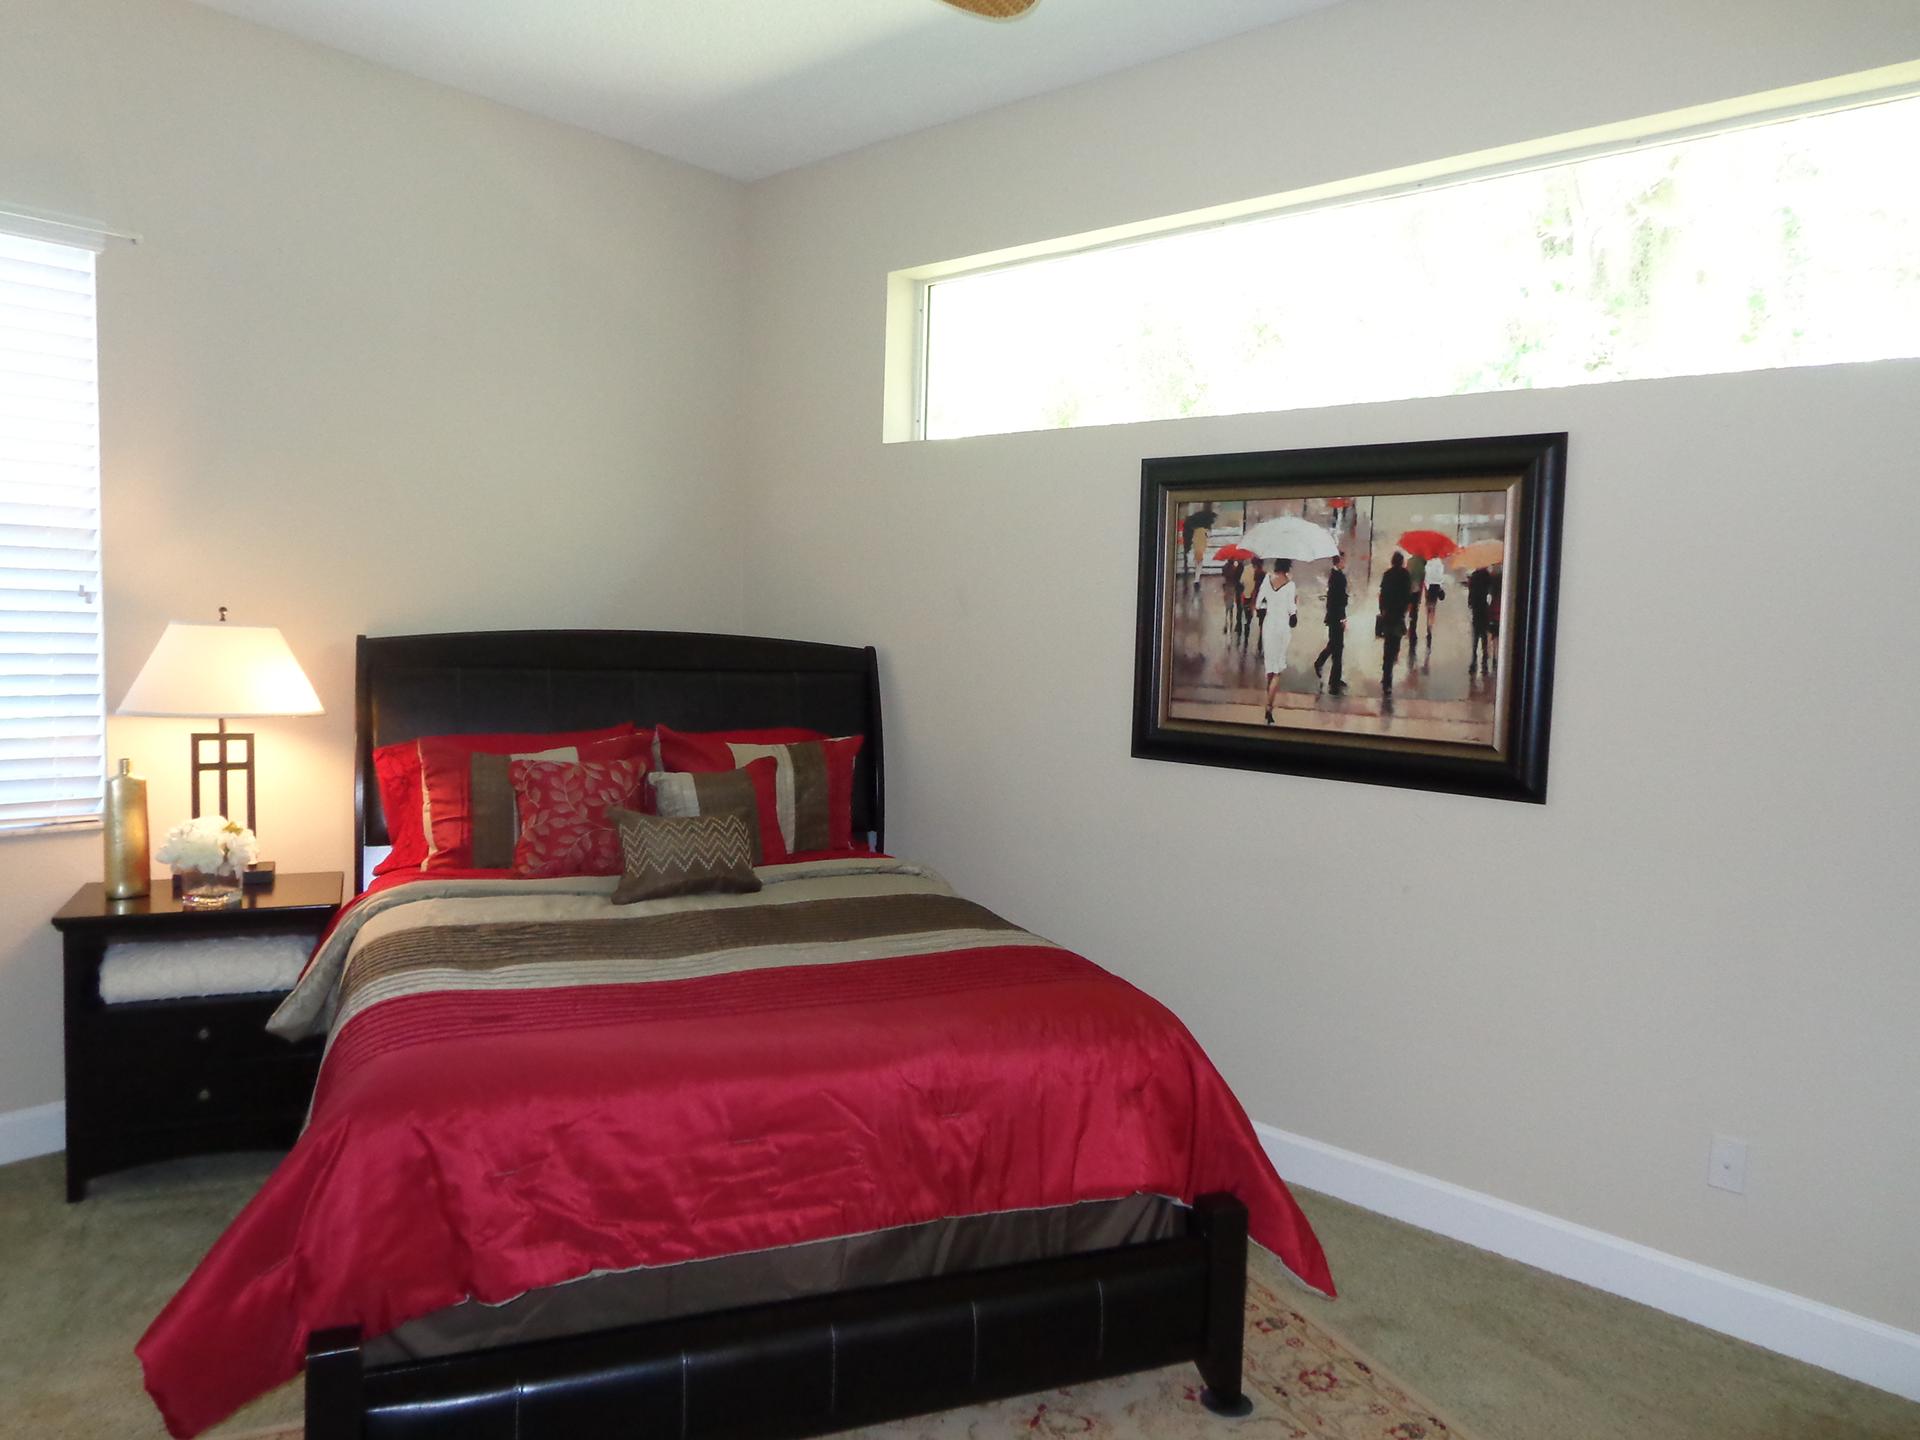 Staged-Assets-Home-Staging-Interior-Design-Palm-Coast-Florida-4